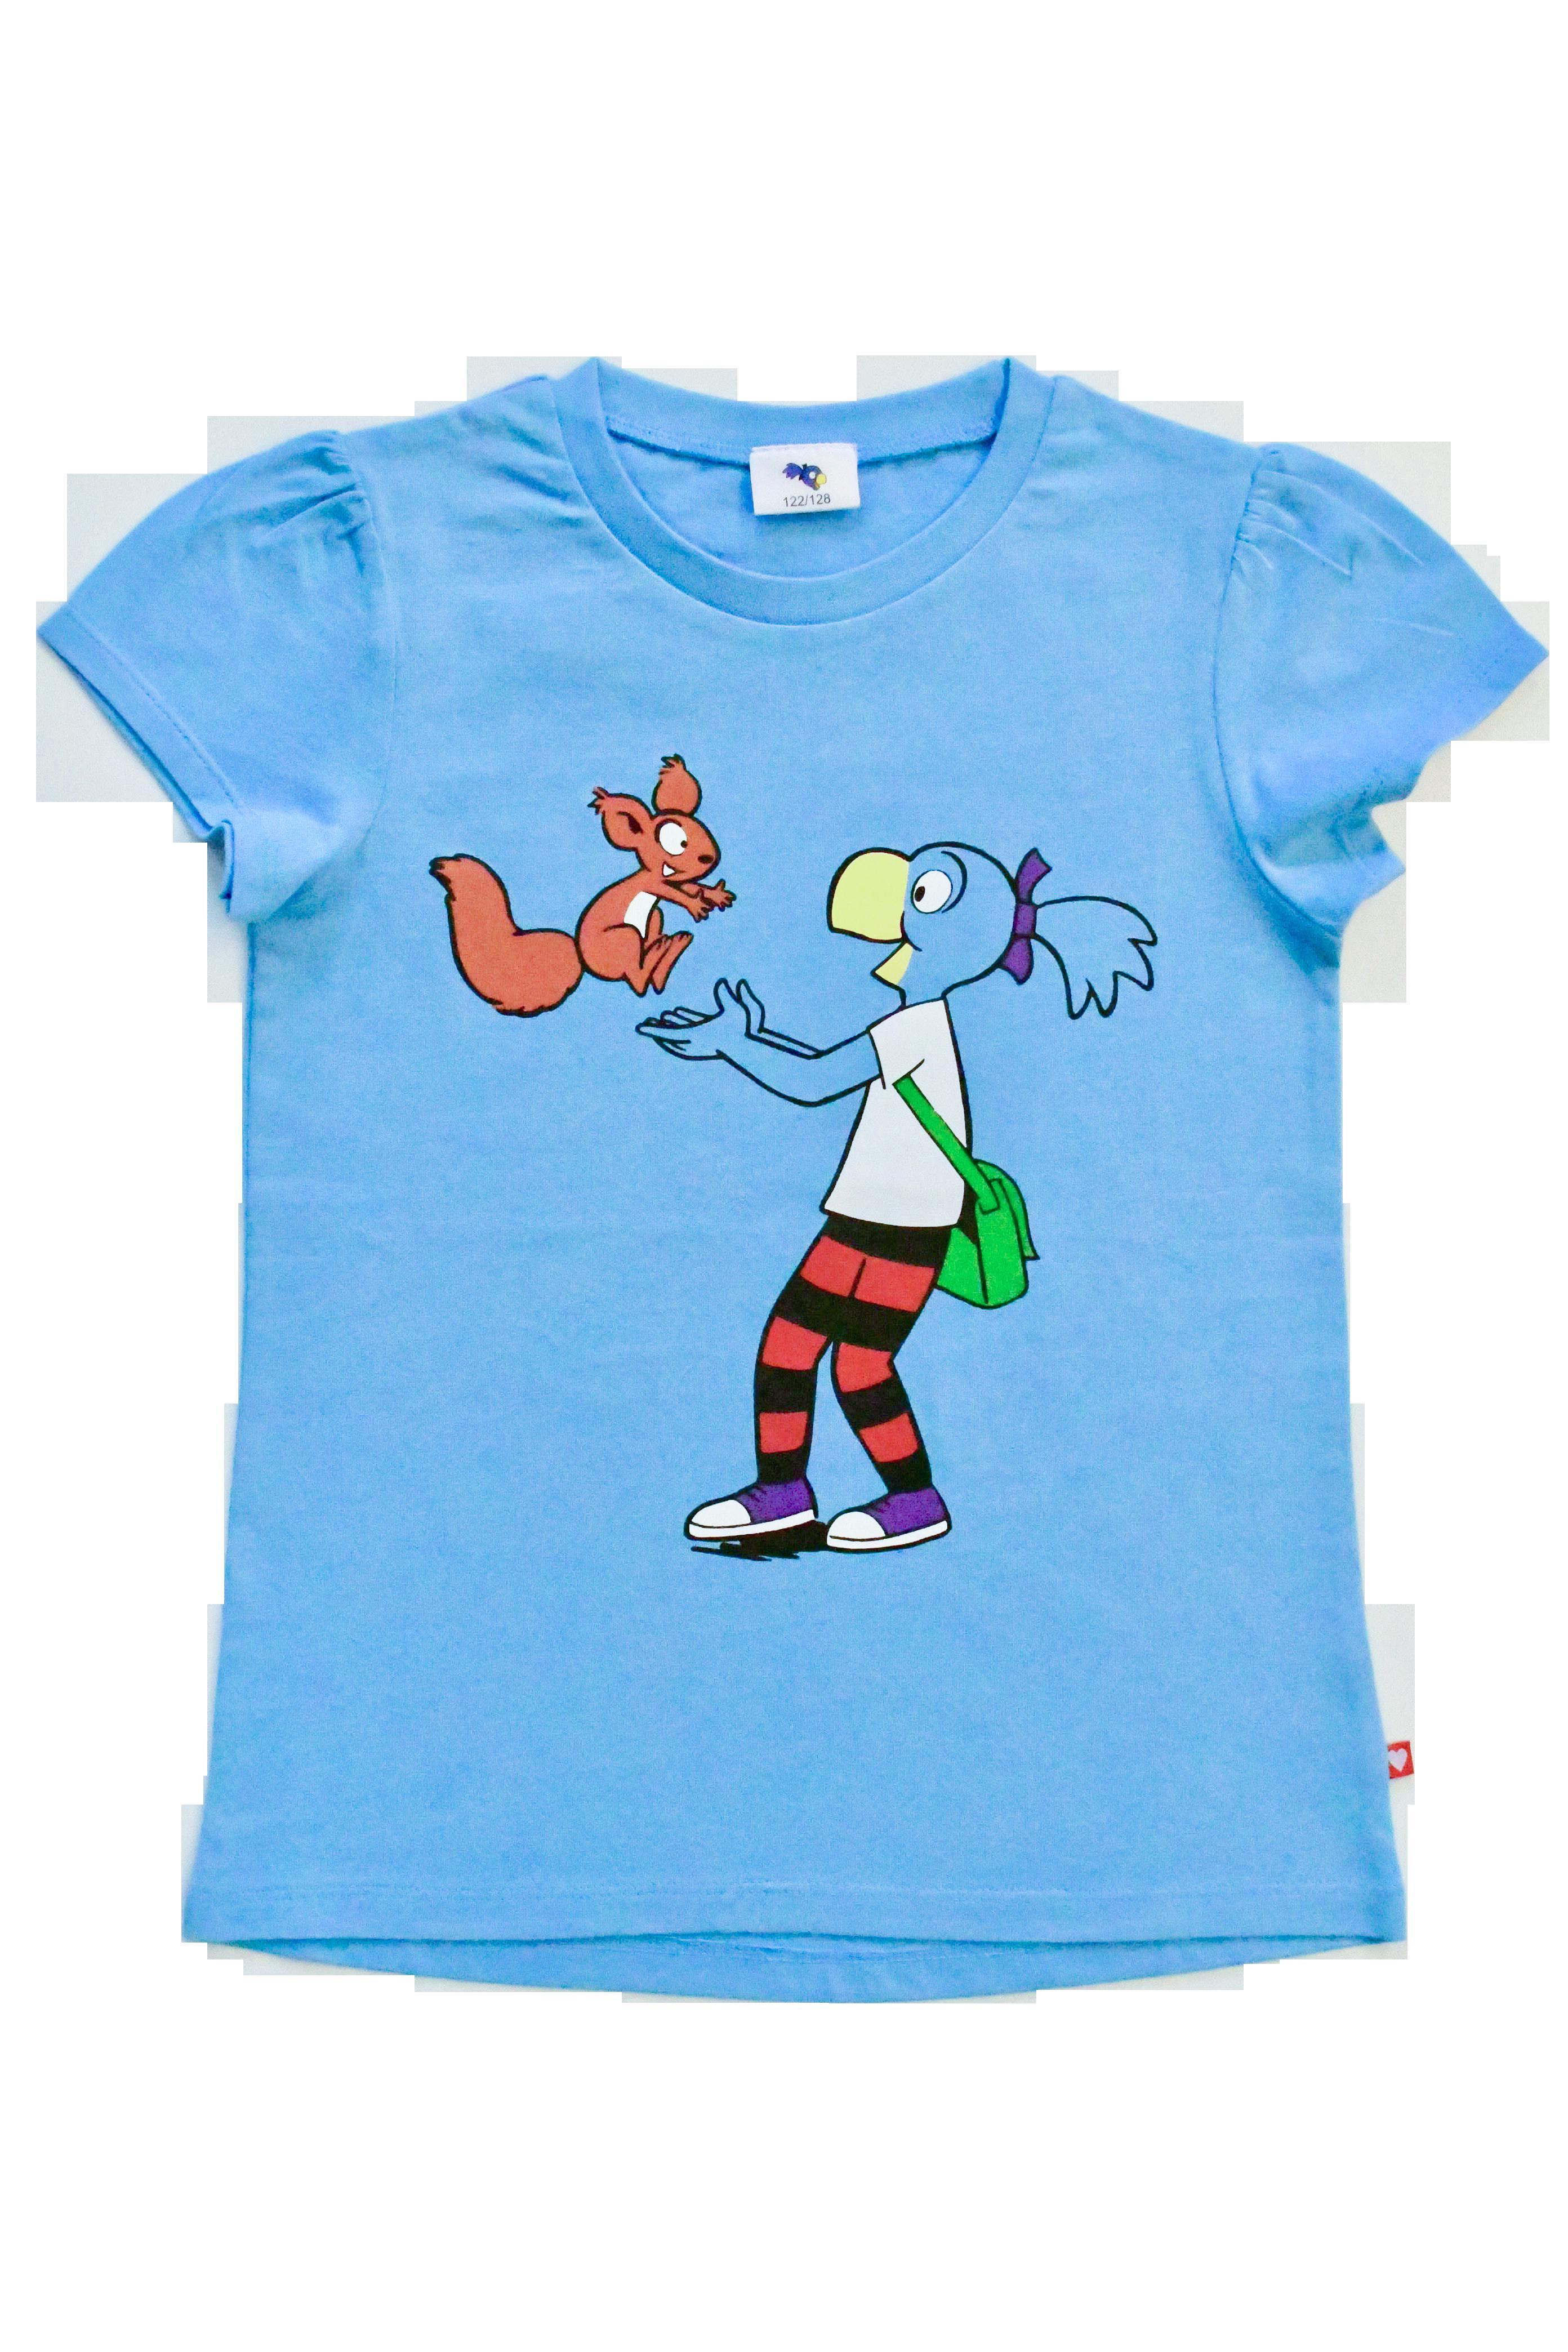 Globine T-Shirt blau stehend 134/140